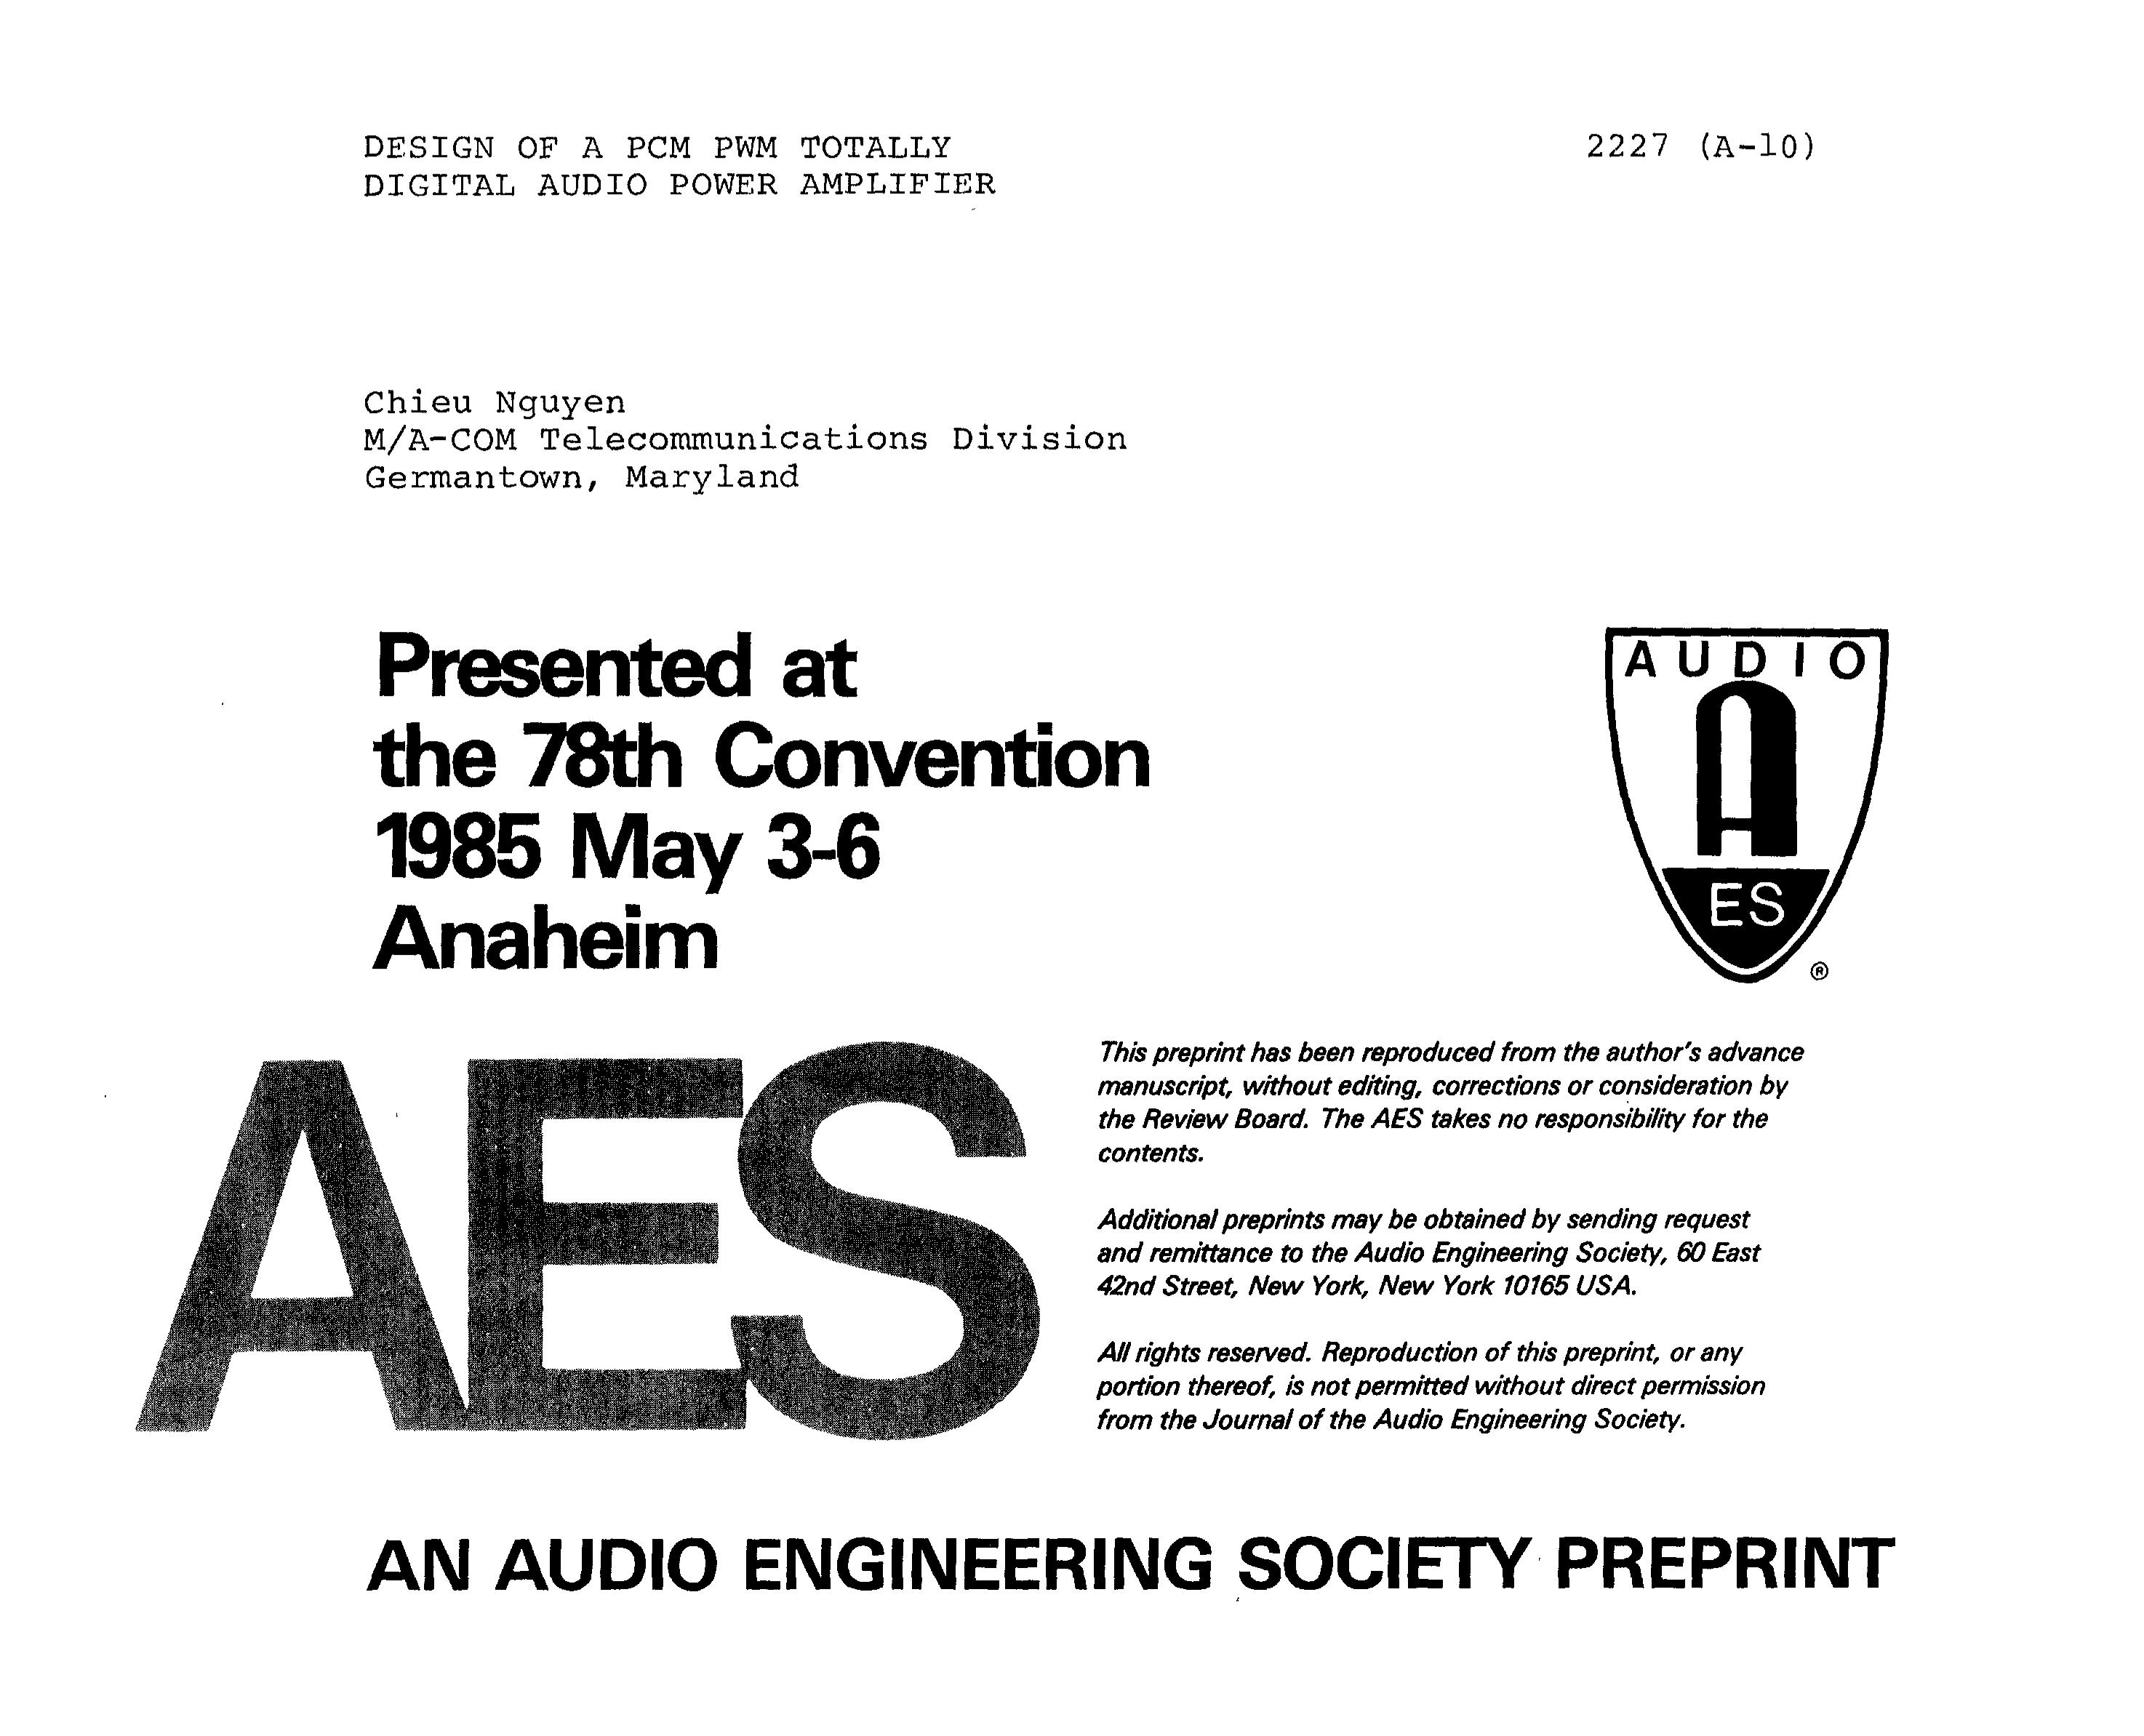 Aes E Library Design Of A Pcm Pwm Totally Digital Audio Power Wiring Diagram Single Chip 25 Watt Mono Classd Amplifier